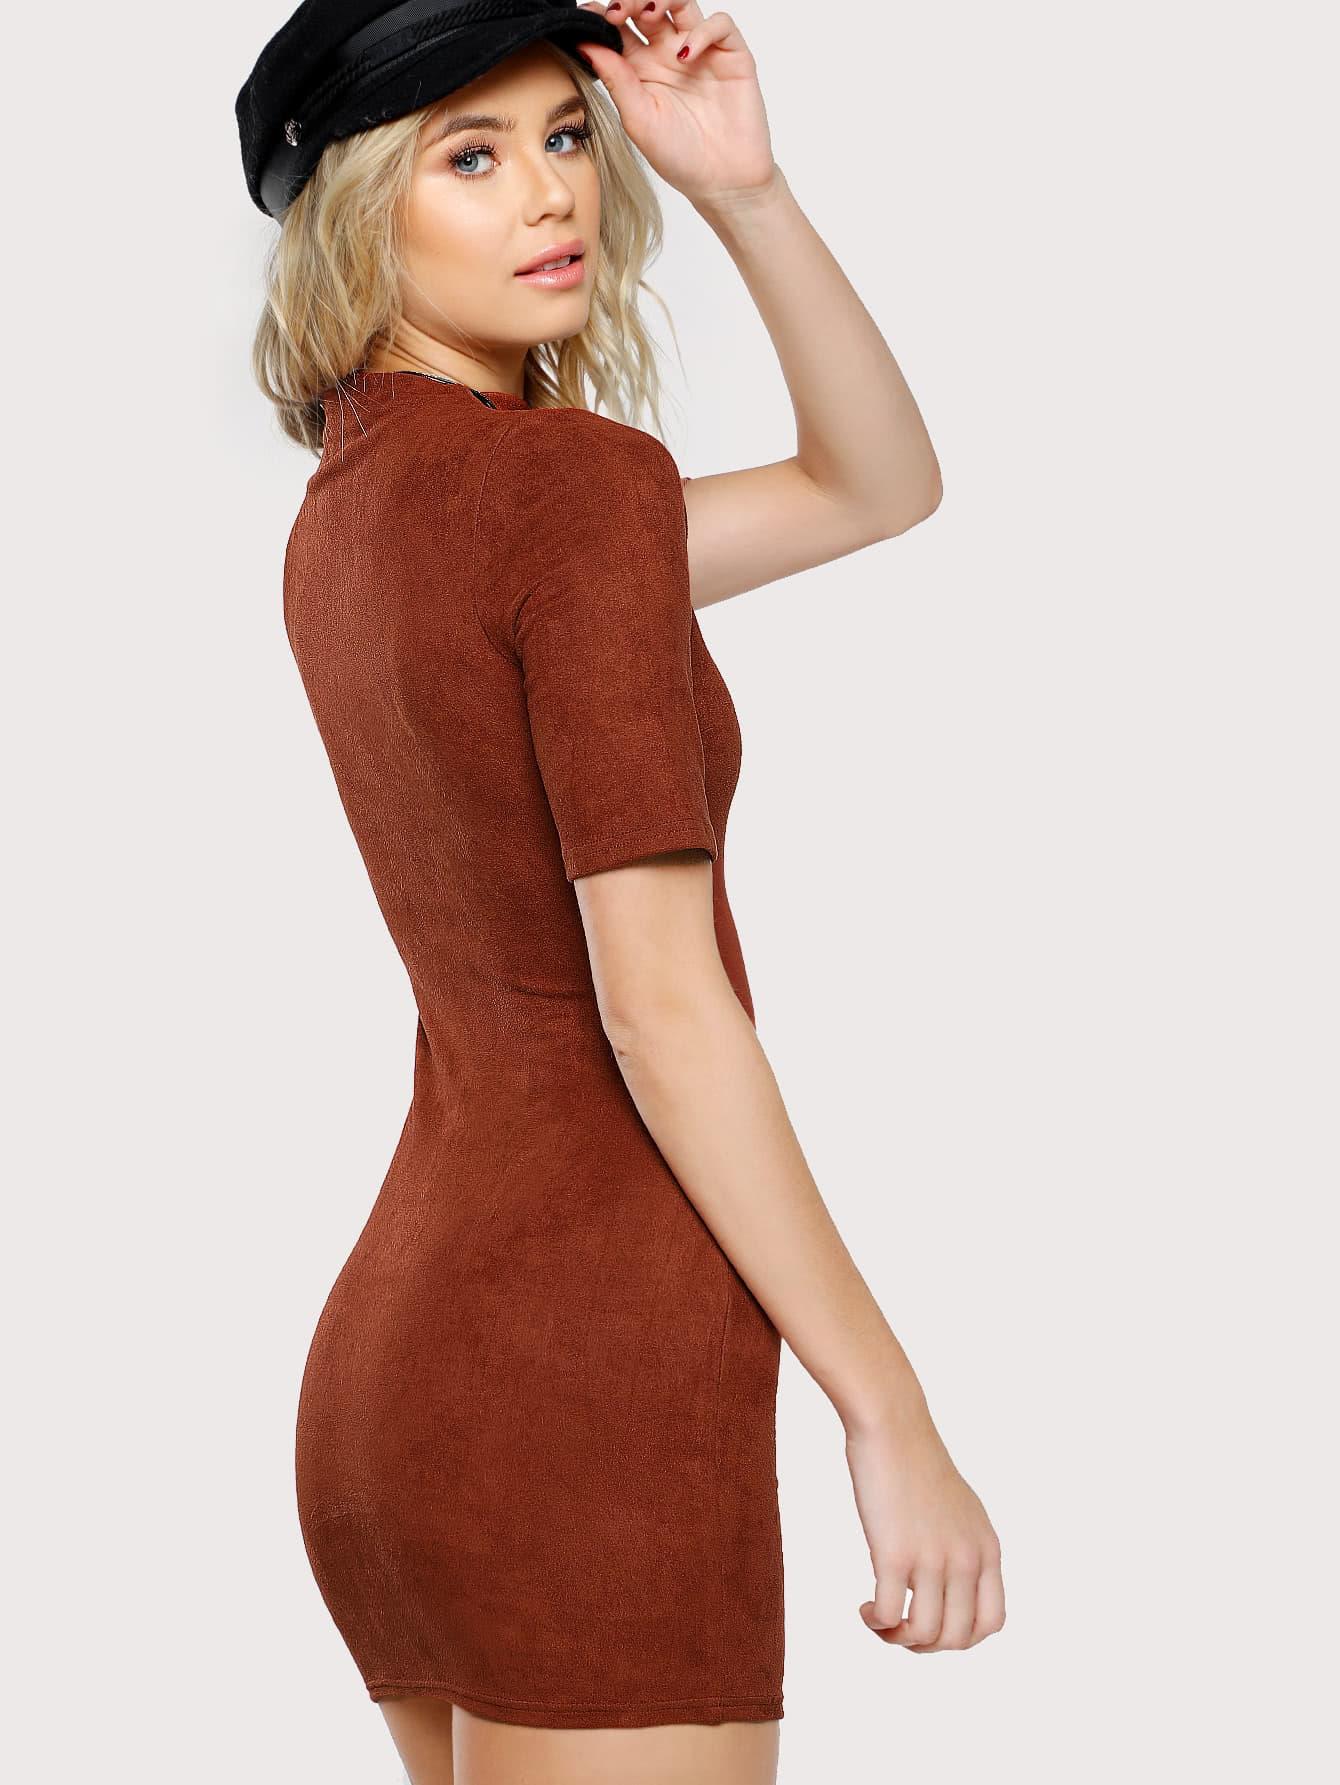 Mock Neck Form Fitting Suede Dress Emmacloth Women Fast